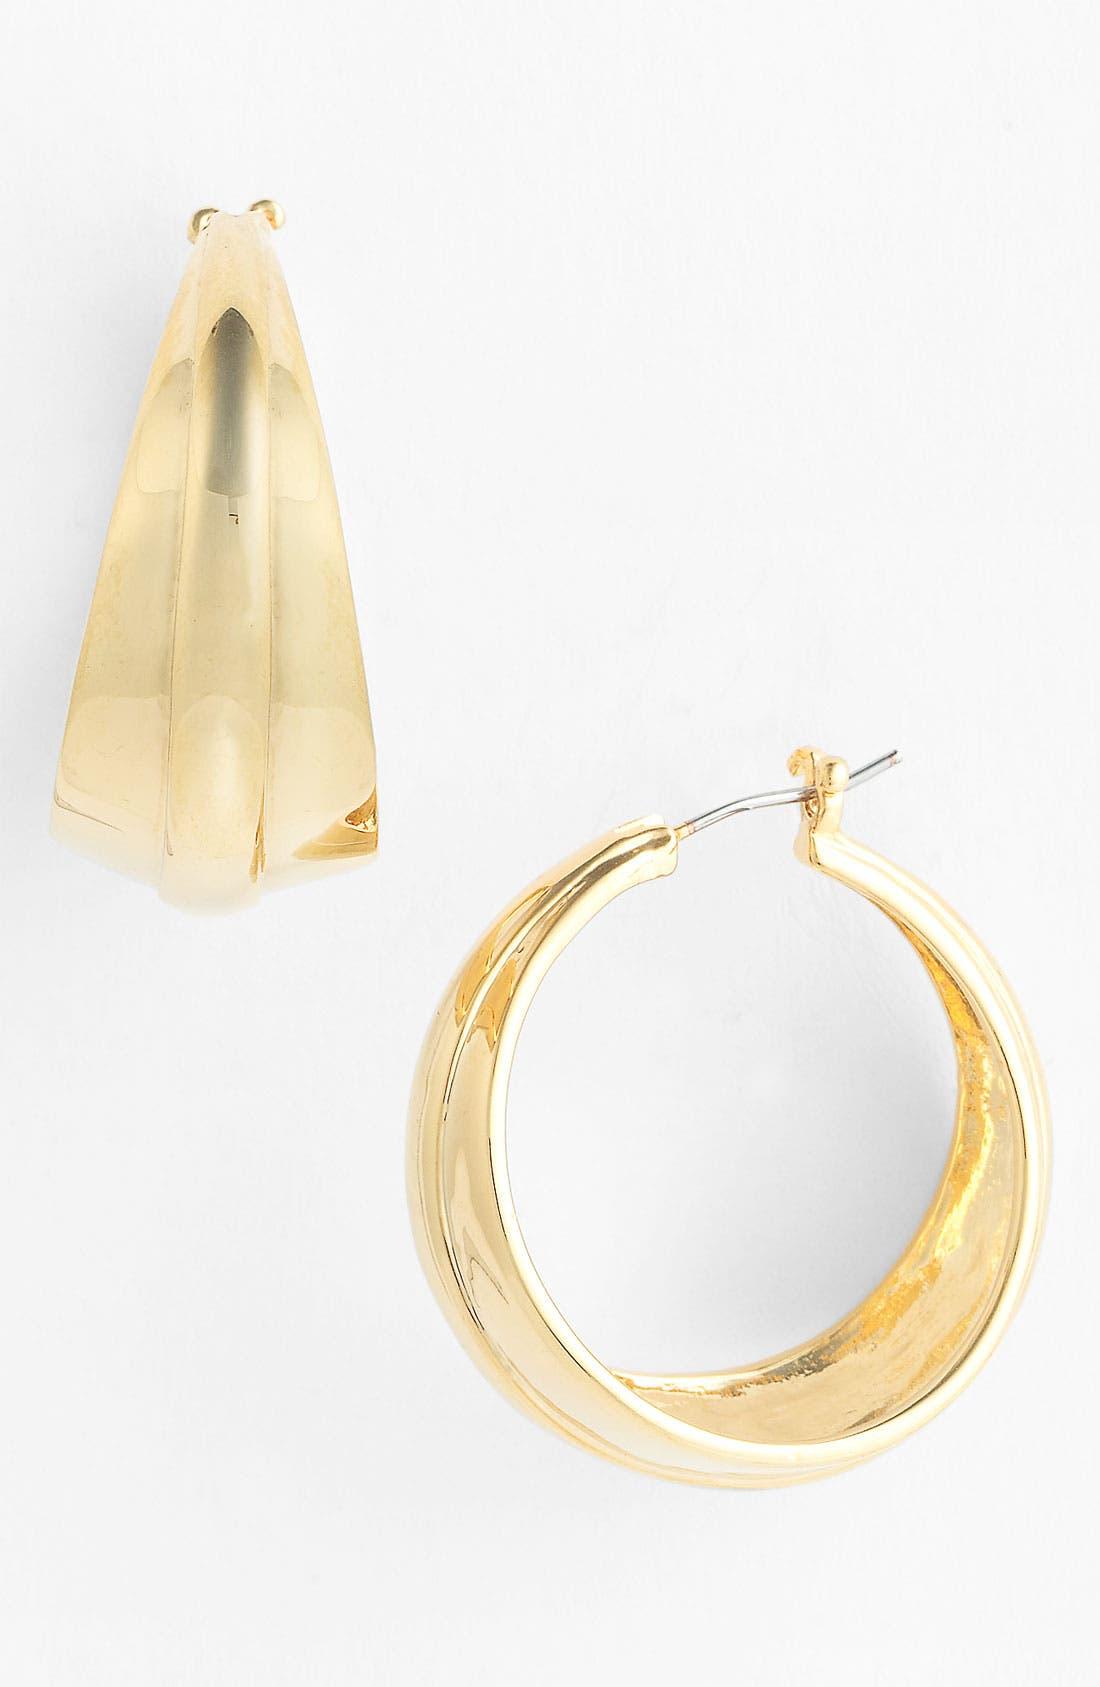 Alternate Image 1 Selected - Vince Camuto 'Basics' Tapered Hoop Earrings